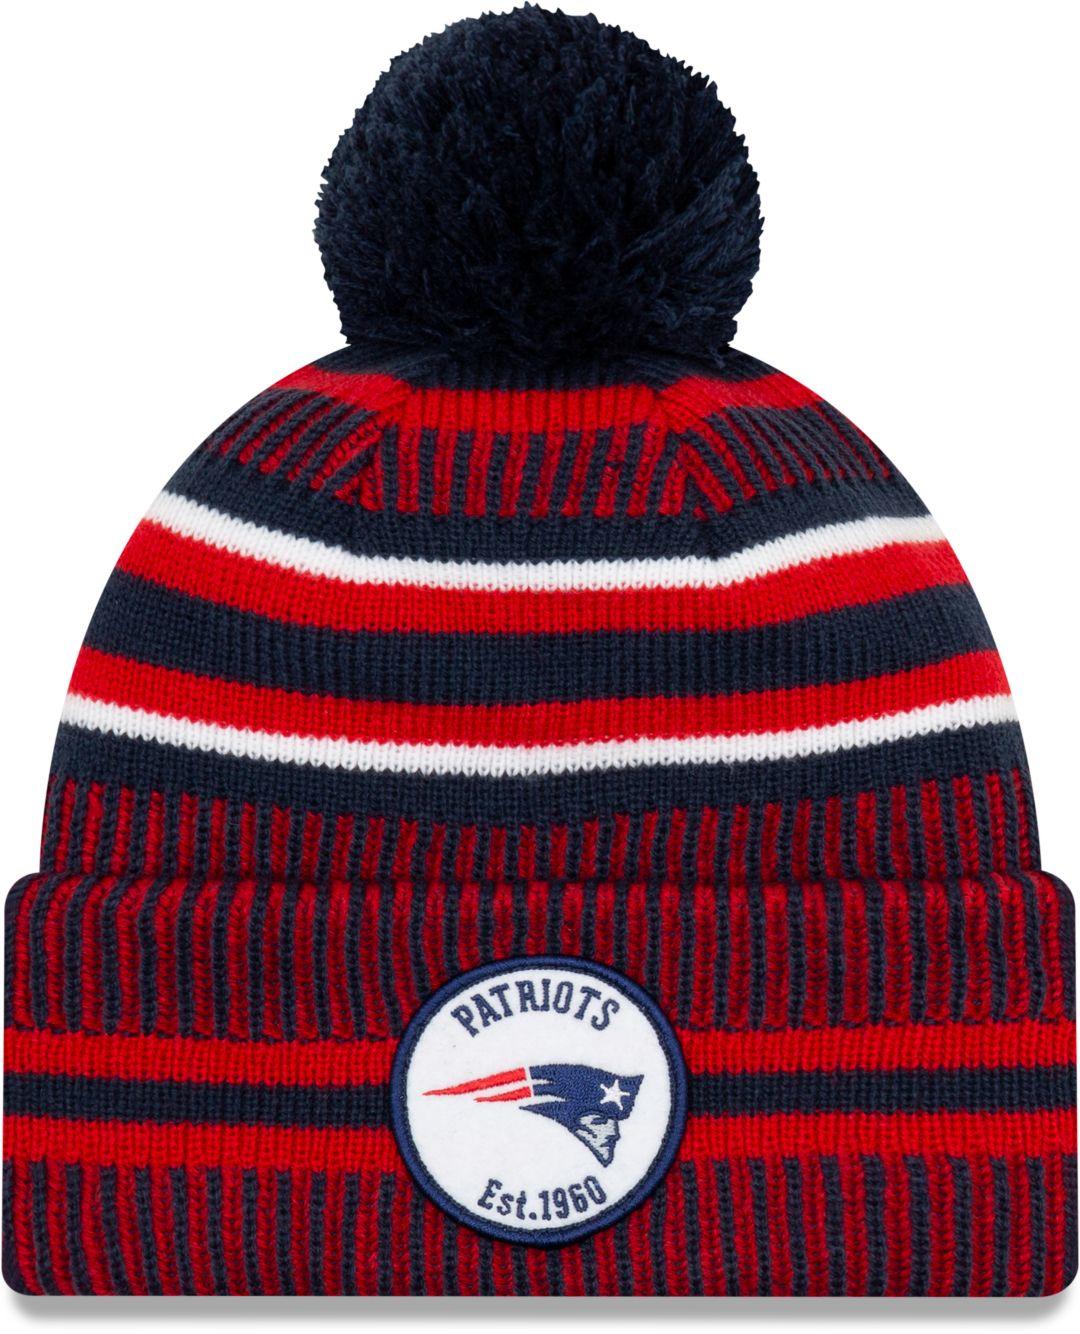 a90cb641d New Era Men's New England Patriots Sideline Home Sport Pom Knit